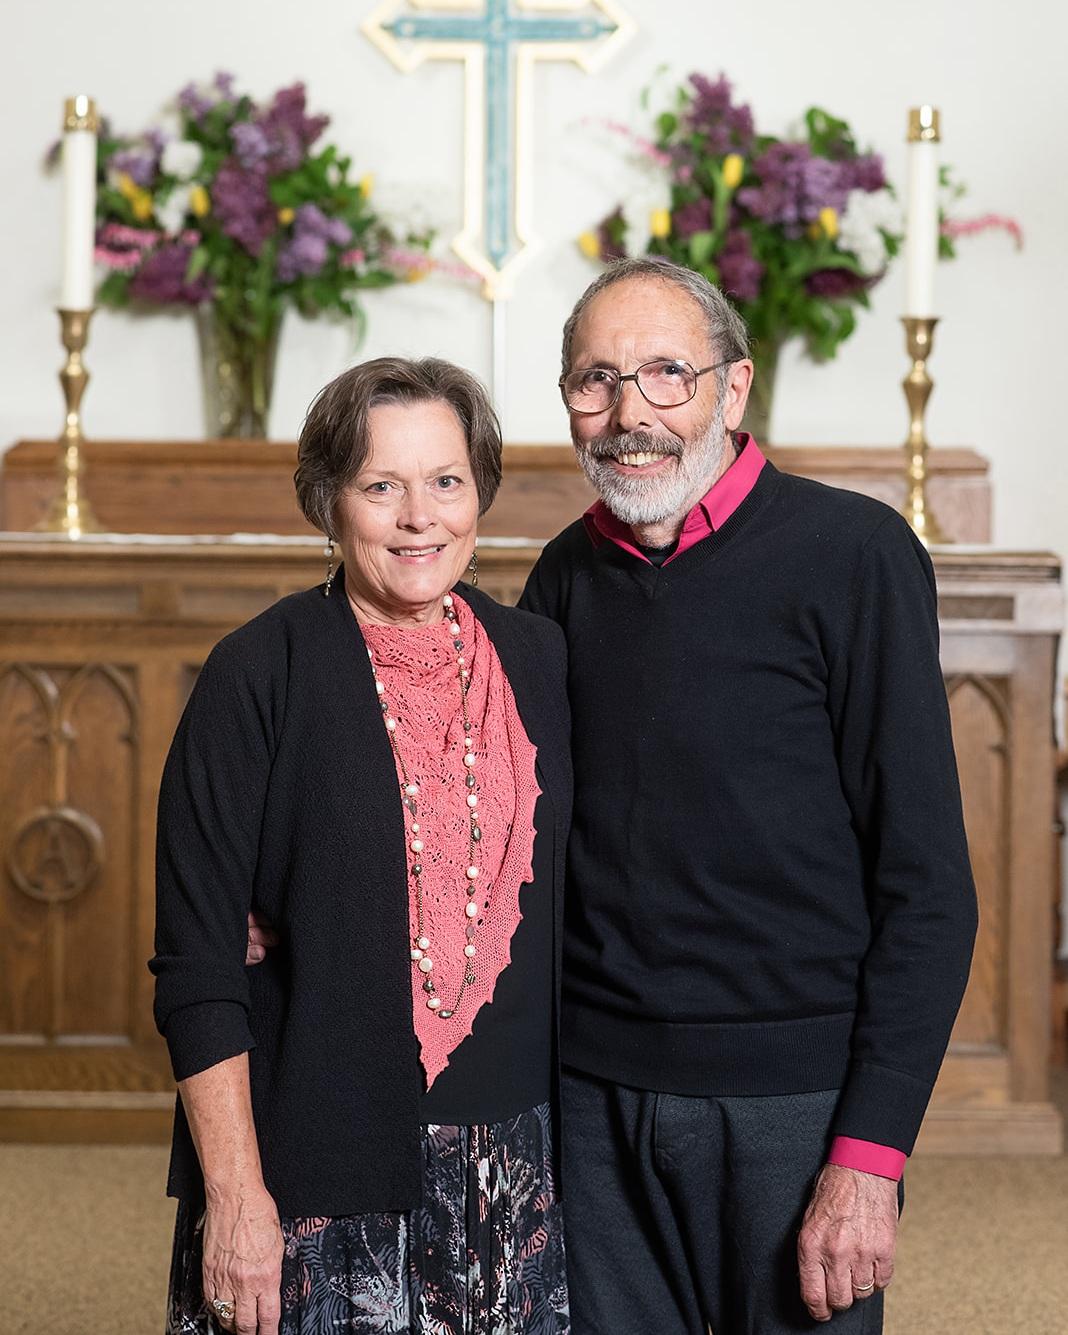 Rev. Cheryl Witham - Pastor of Formation